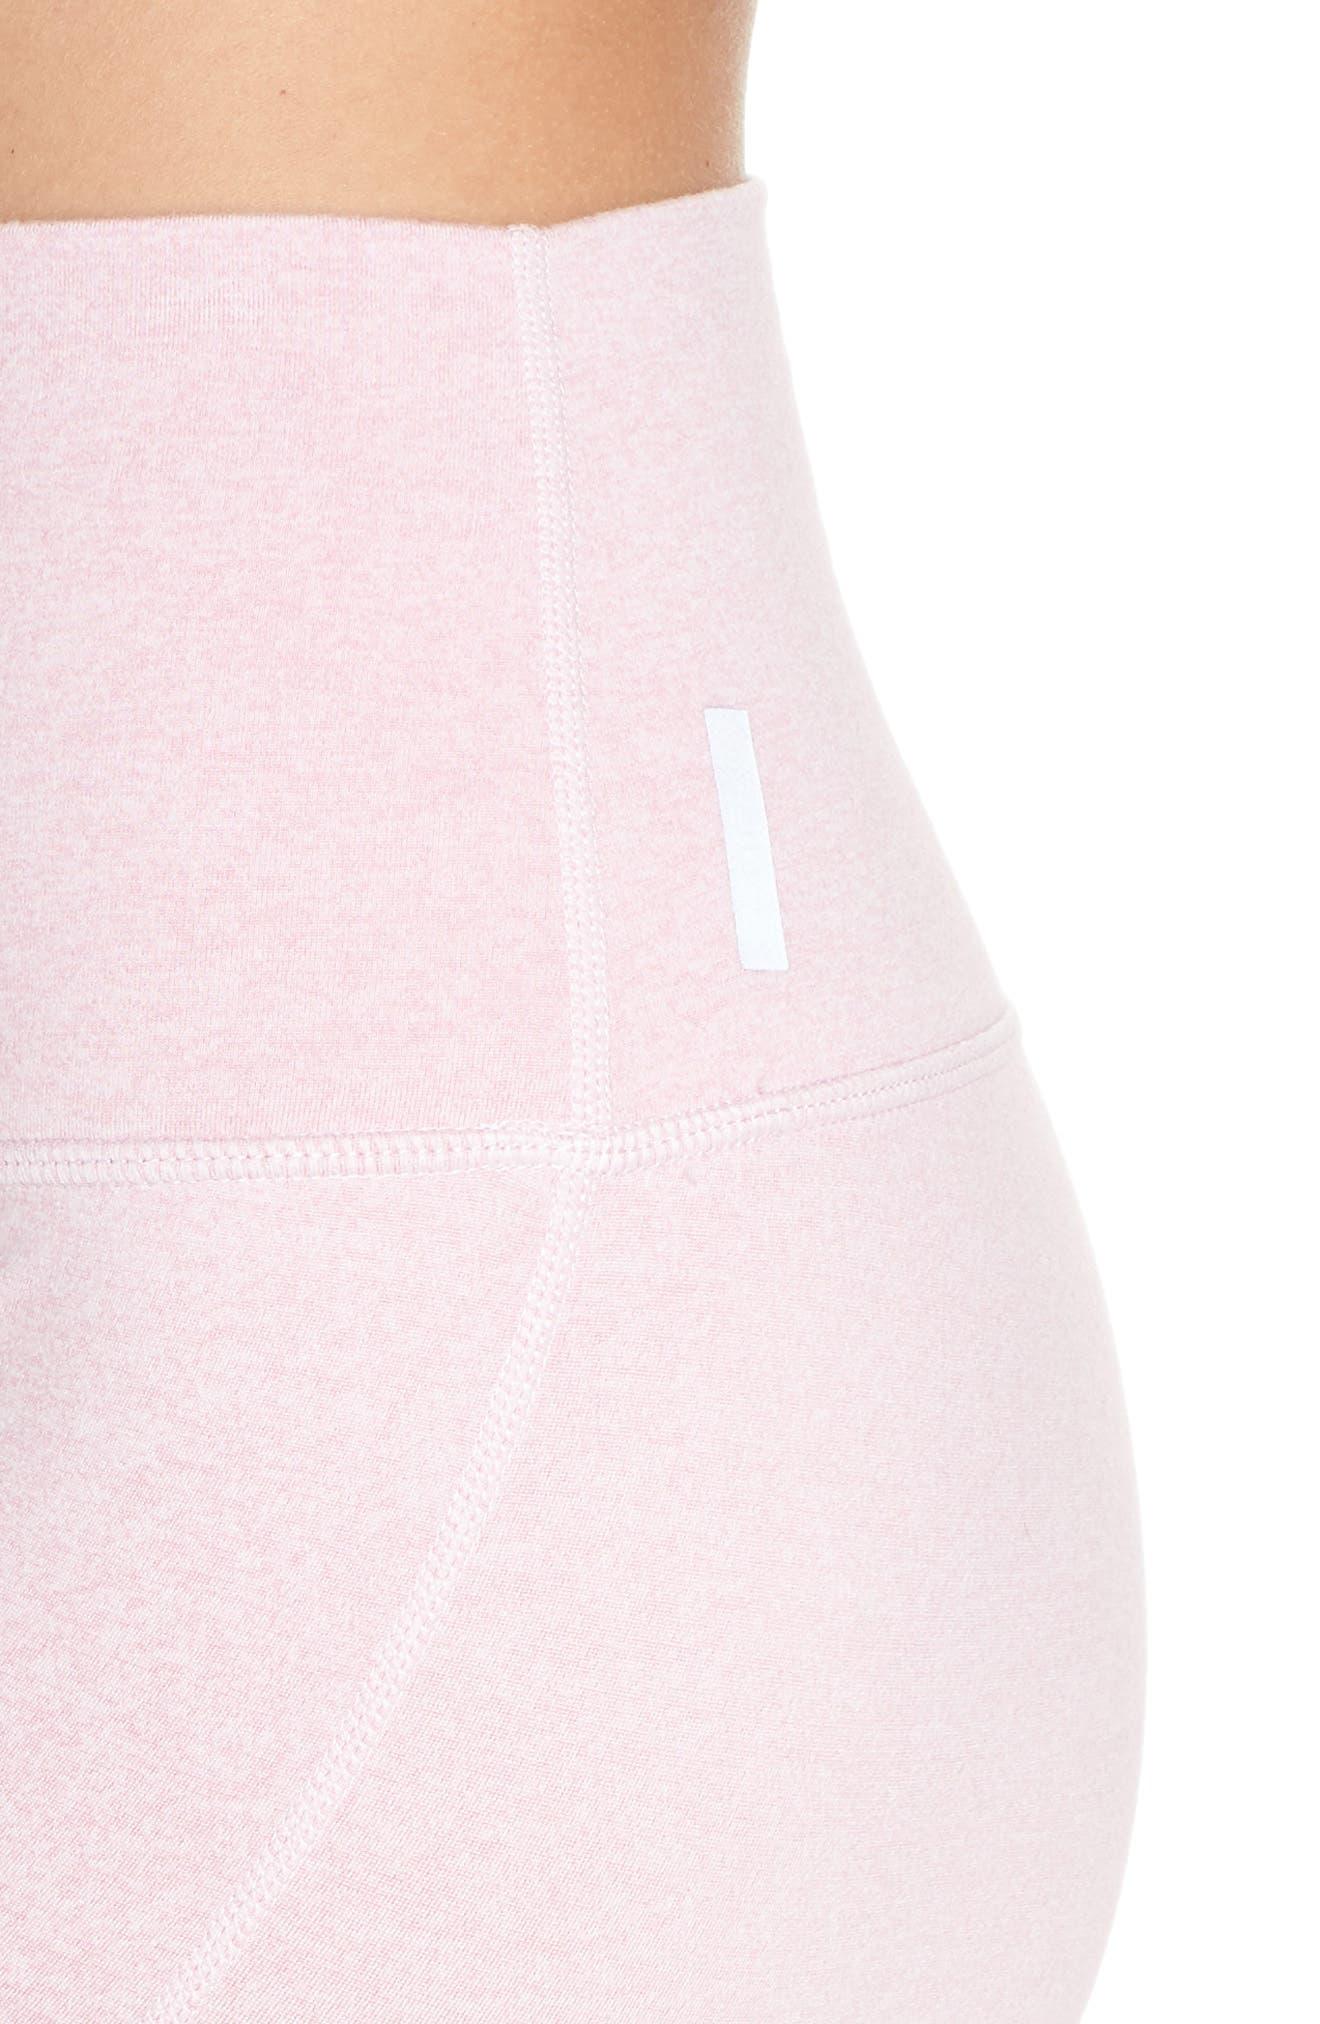 Ultrasoft Recycled High Waist Leggings,                             Alternate thumbnail 4, color,                             PURPLE FRAGRANT